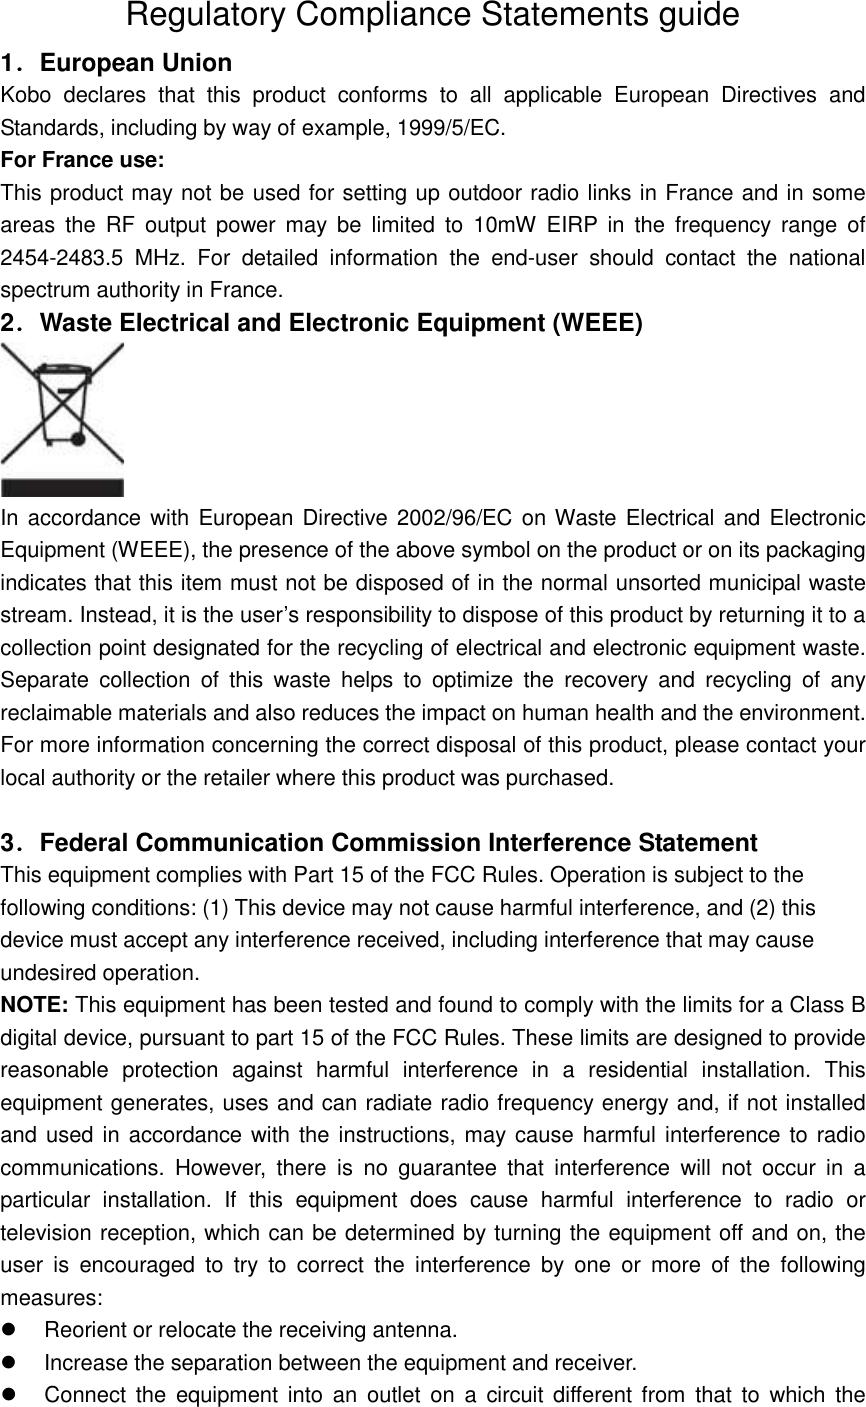 rakuten kobo kobon905 ereader user manual kebo compliance statement rh usermanual wiki kobo instruction manual kobo touch user manual pdf